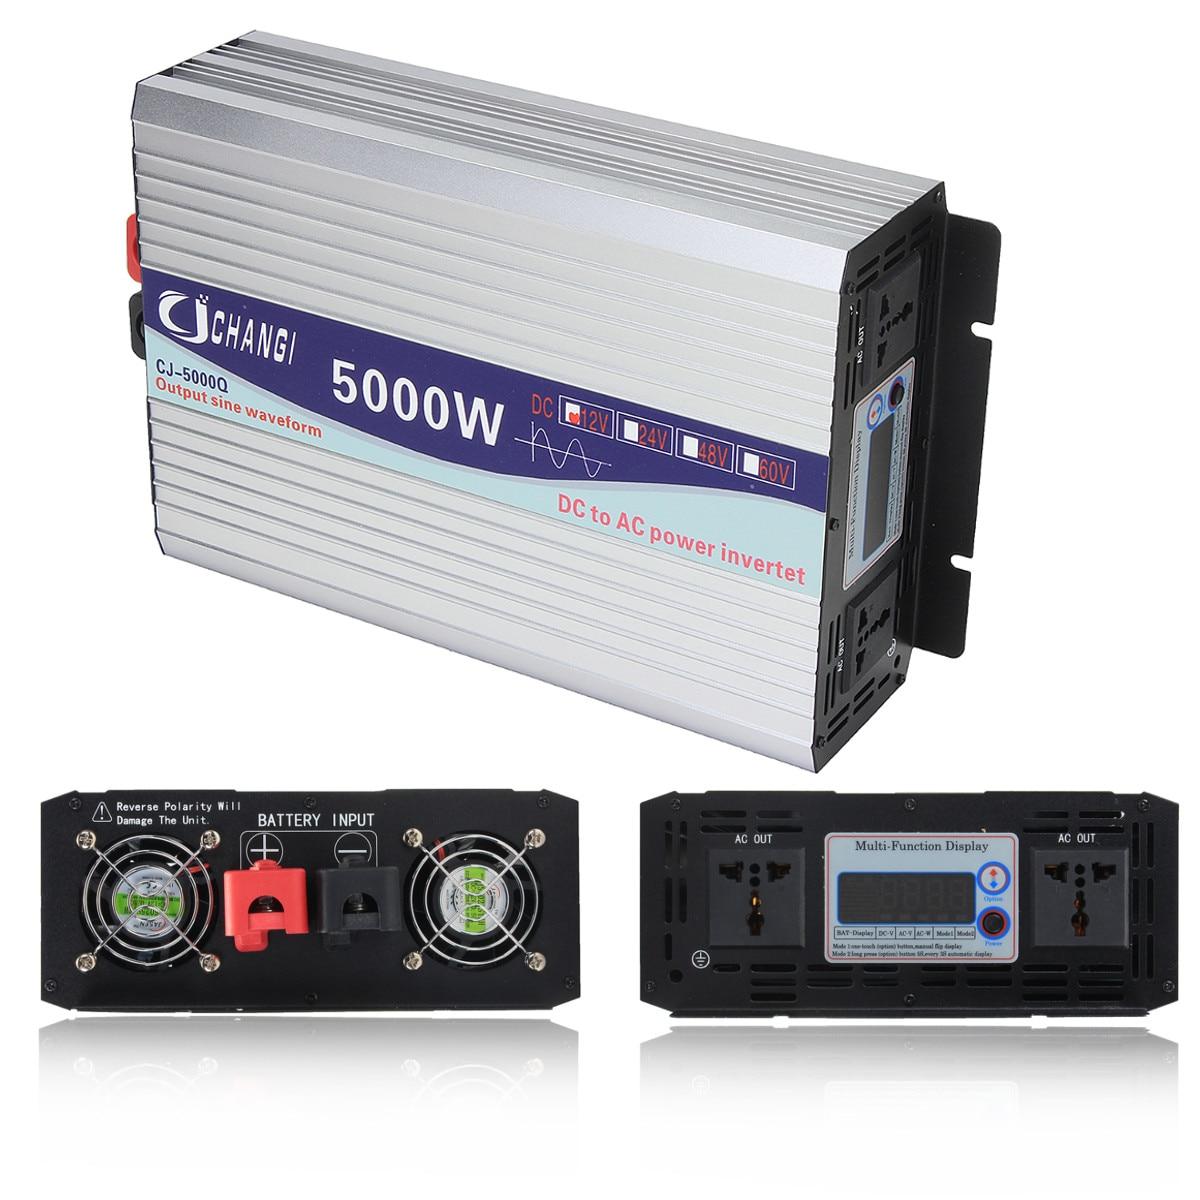 Écran Intelligent pur onduleur à onde sinusoïdale 12 V/24 V à 220 V 3000 W/4000 W/5000 W/6000 W convertisseur adaptateur écran LCD - 5